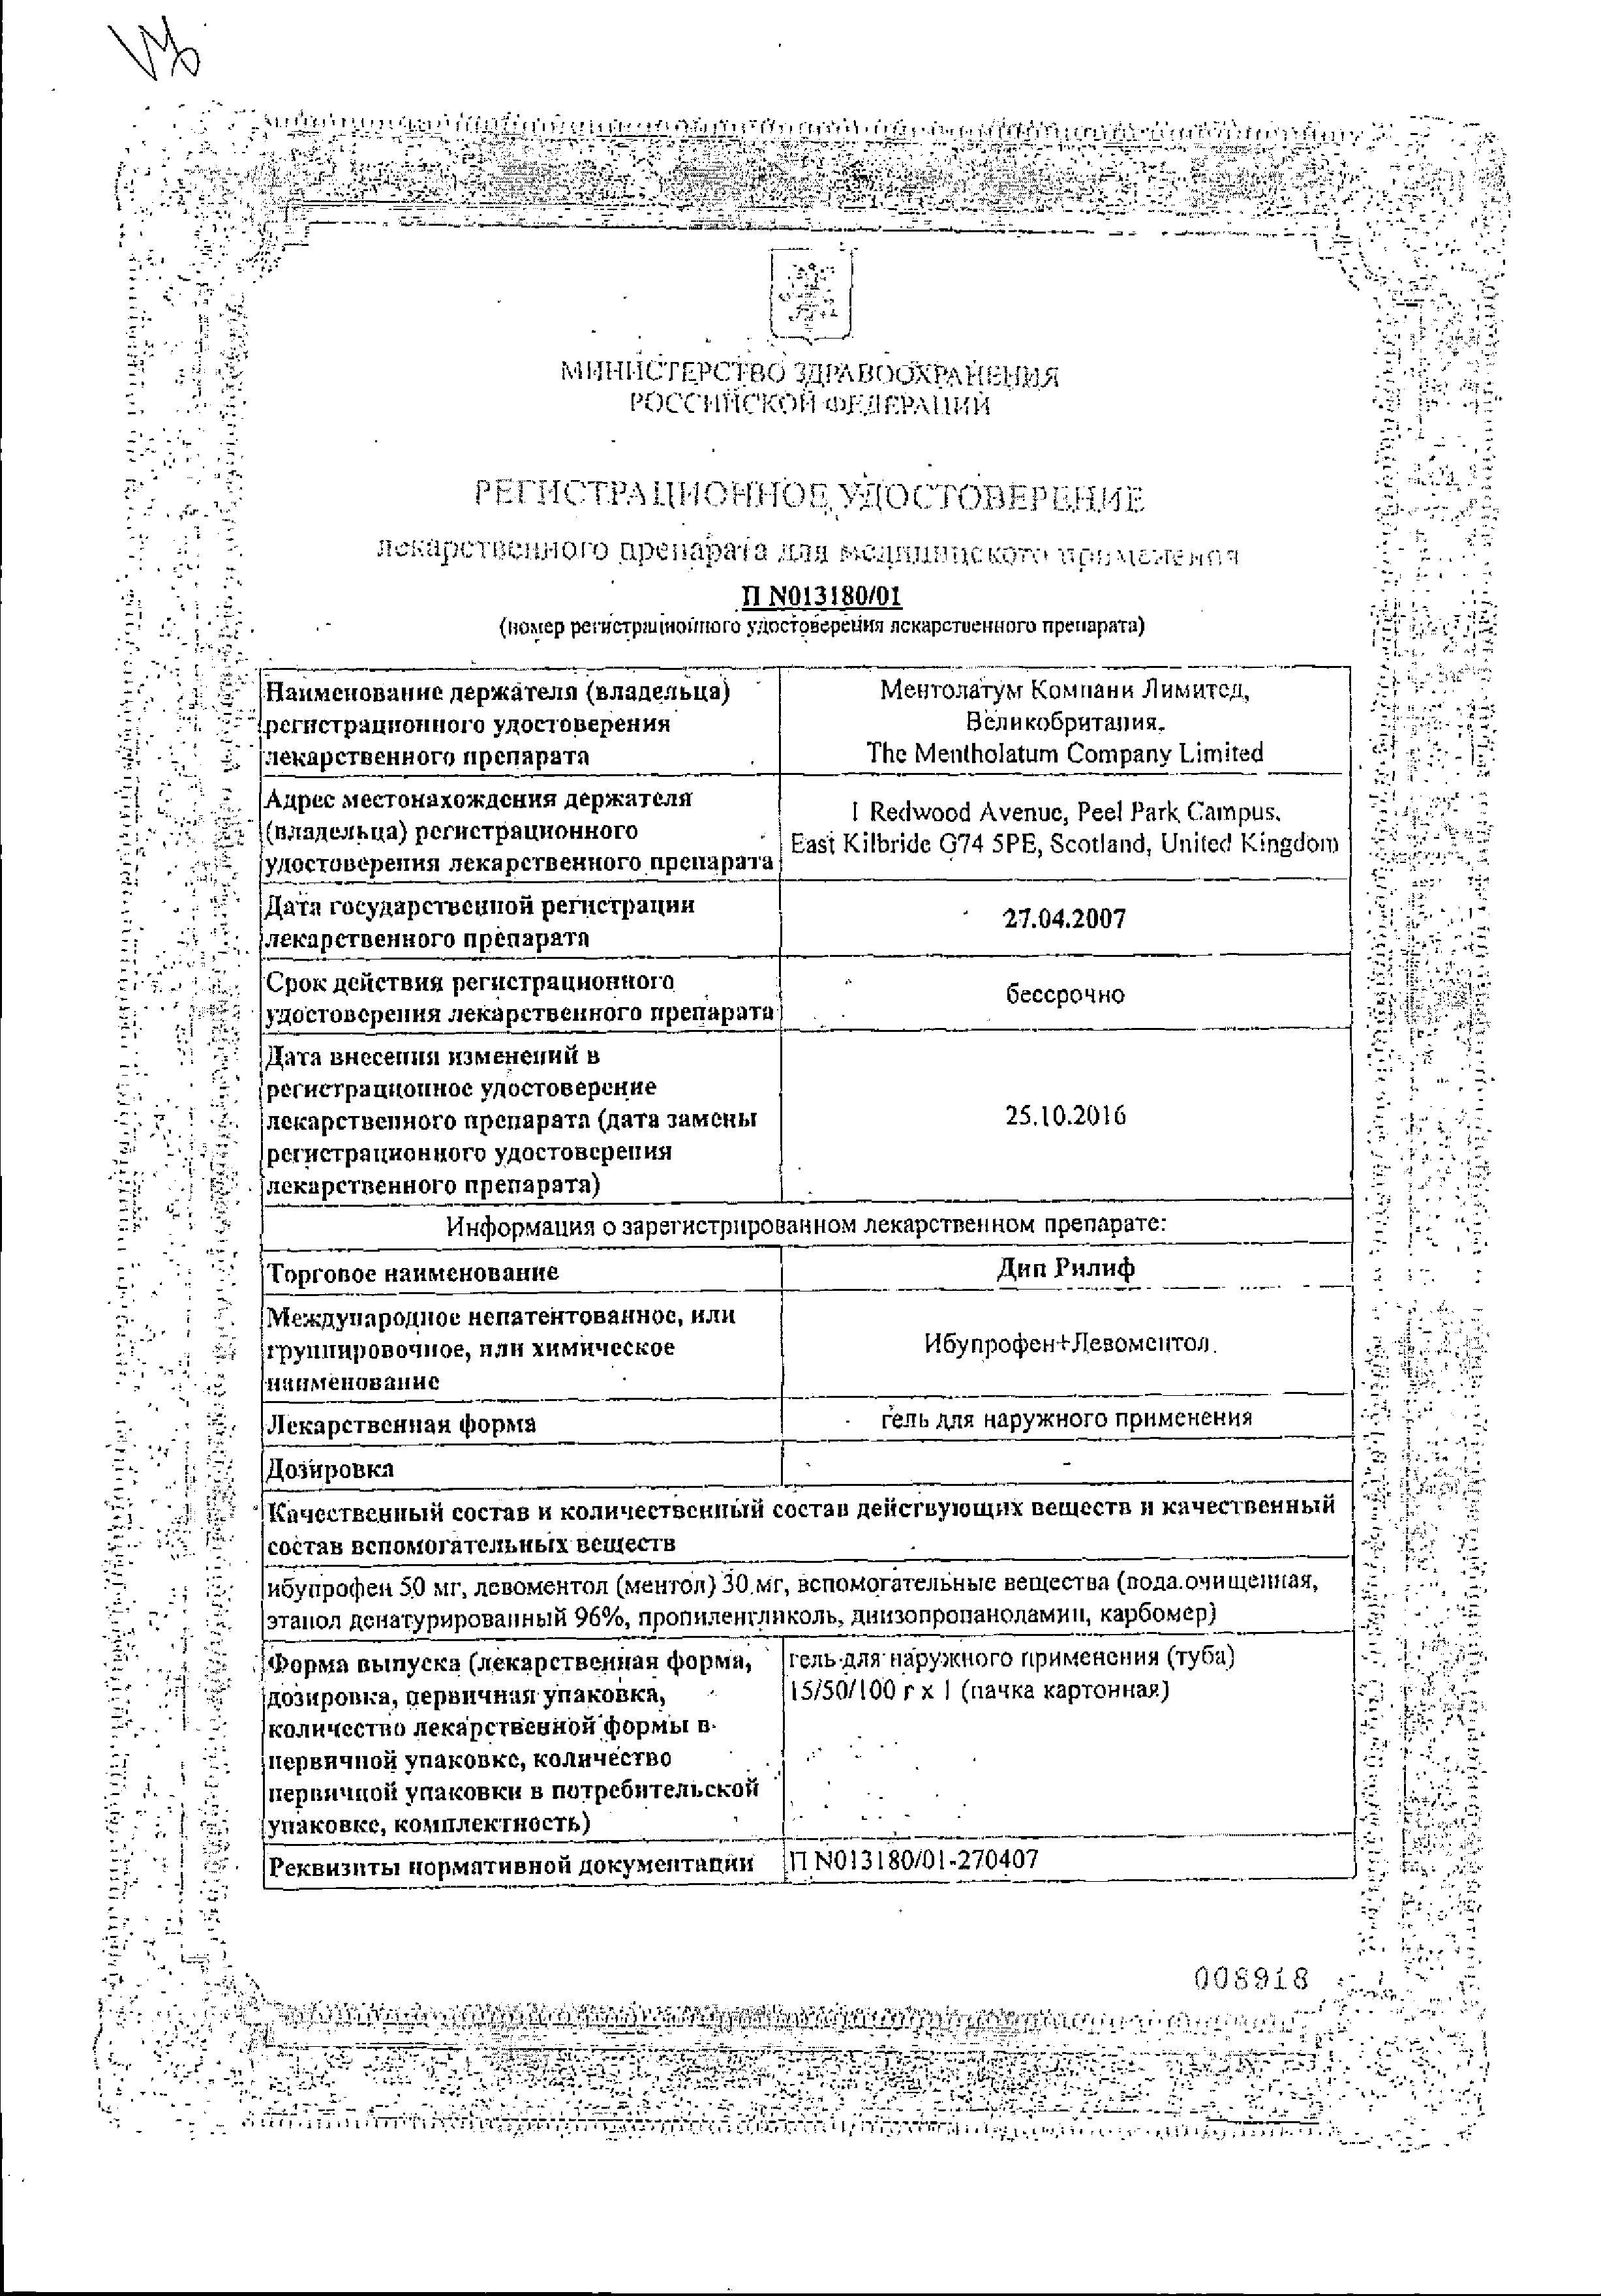 Дип Рилиф сертификат